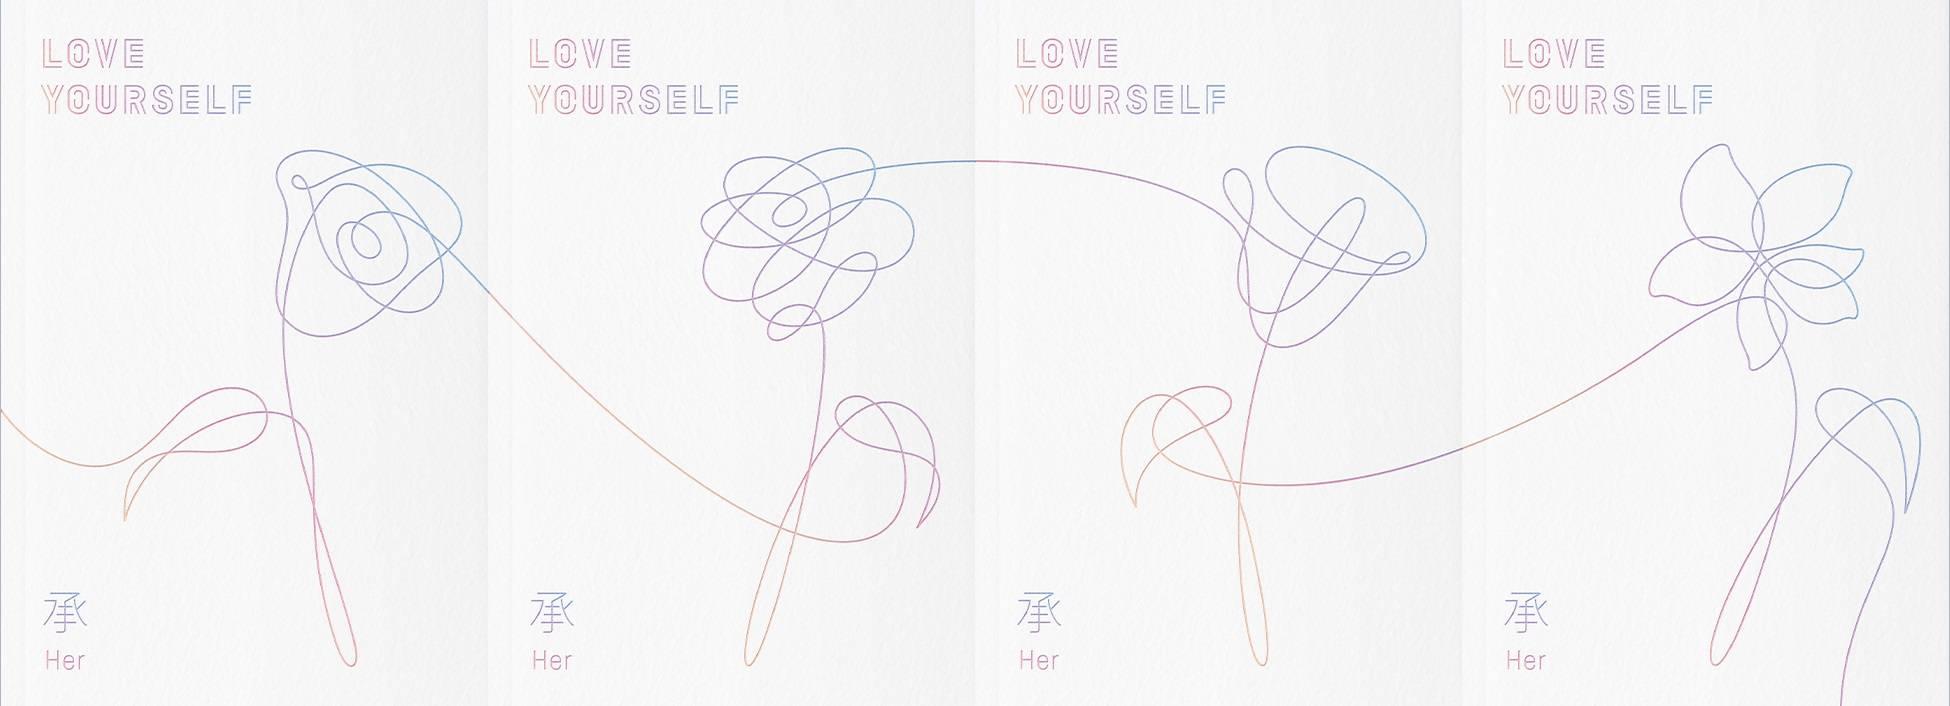 BTS - 5th Mini Album: Love Yourself 承 [Her] CD (Ver. L)